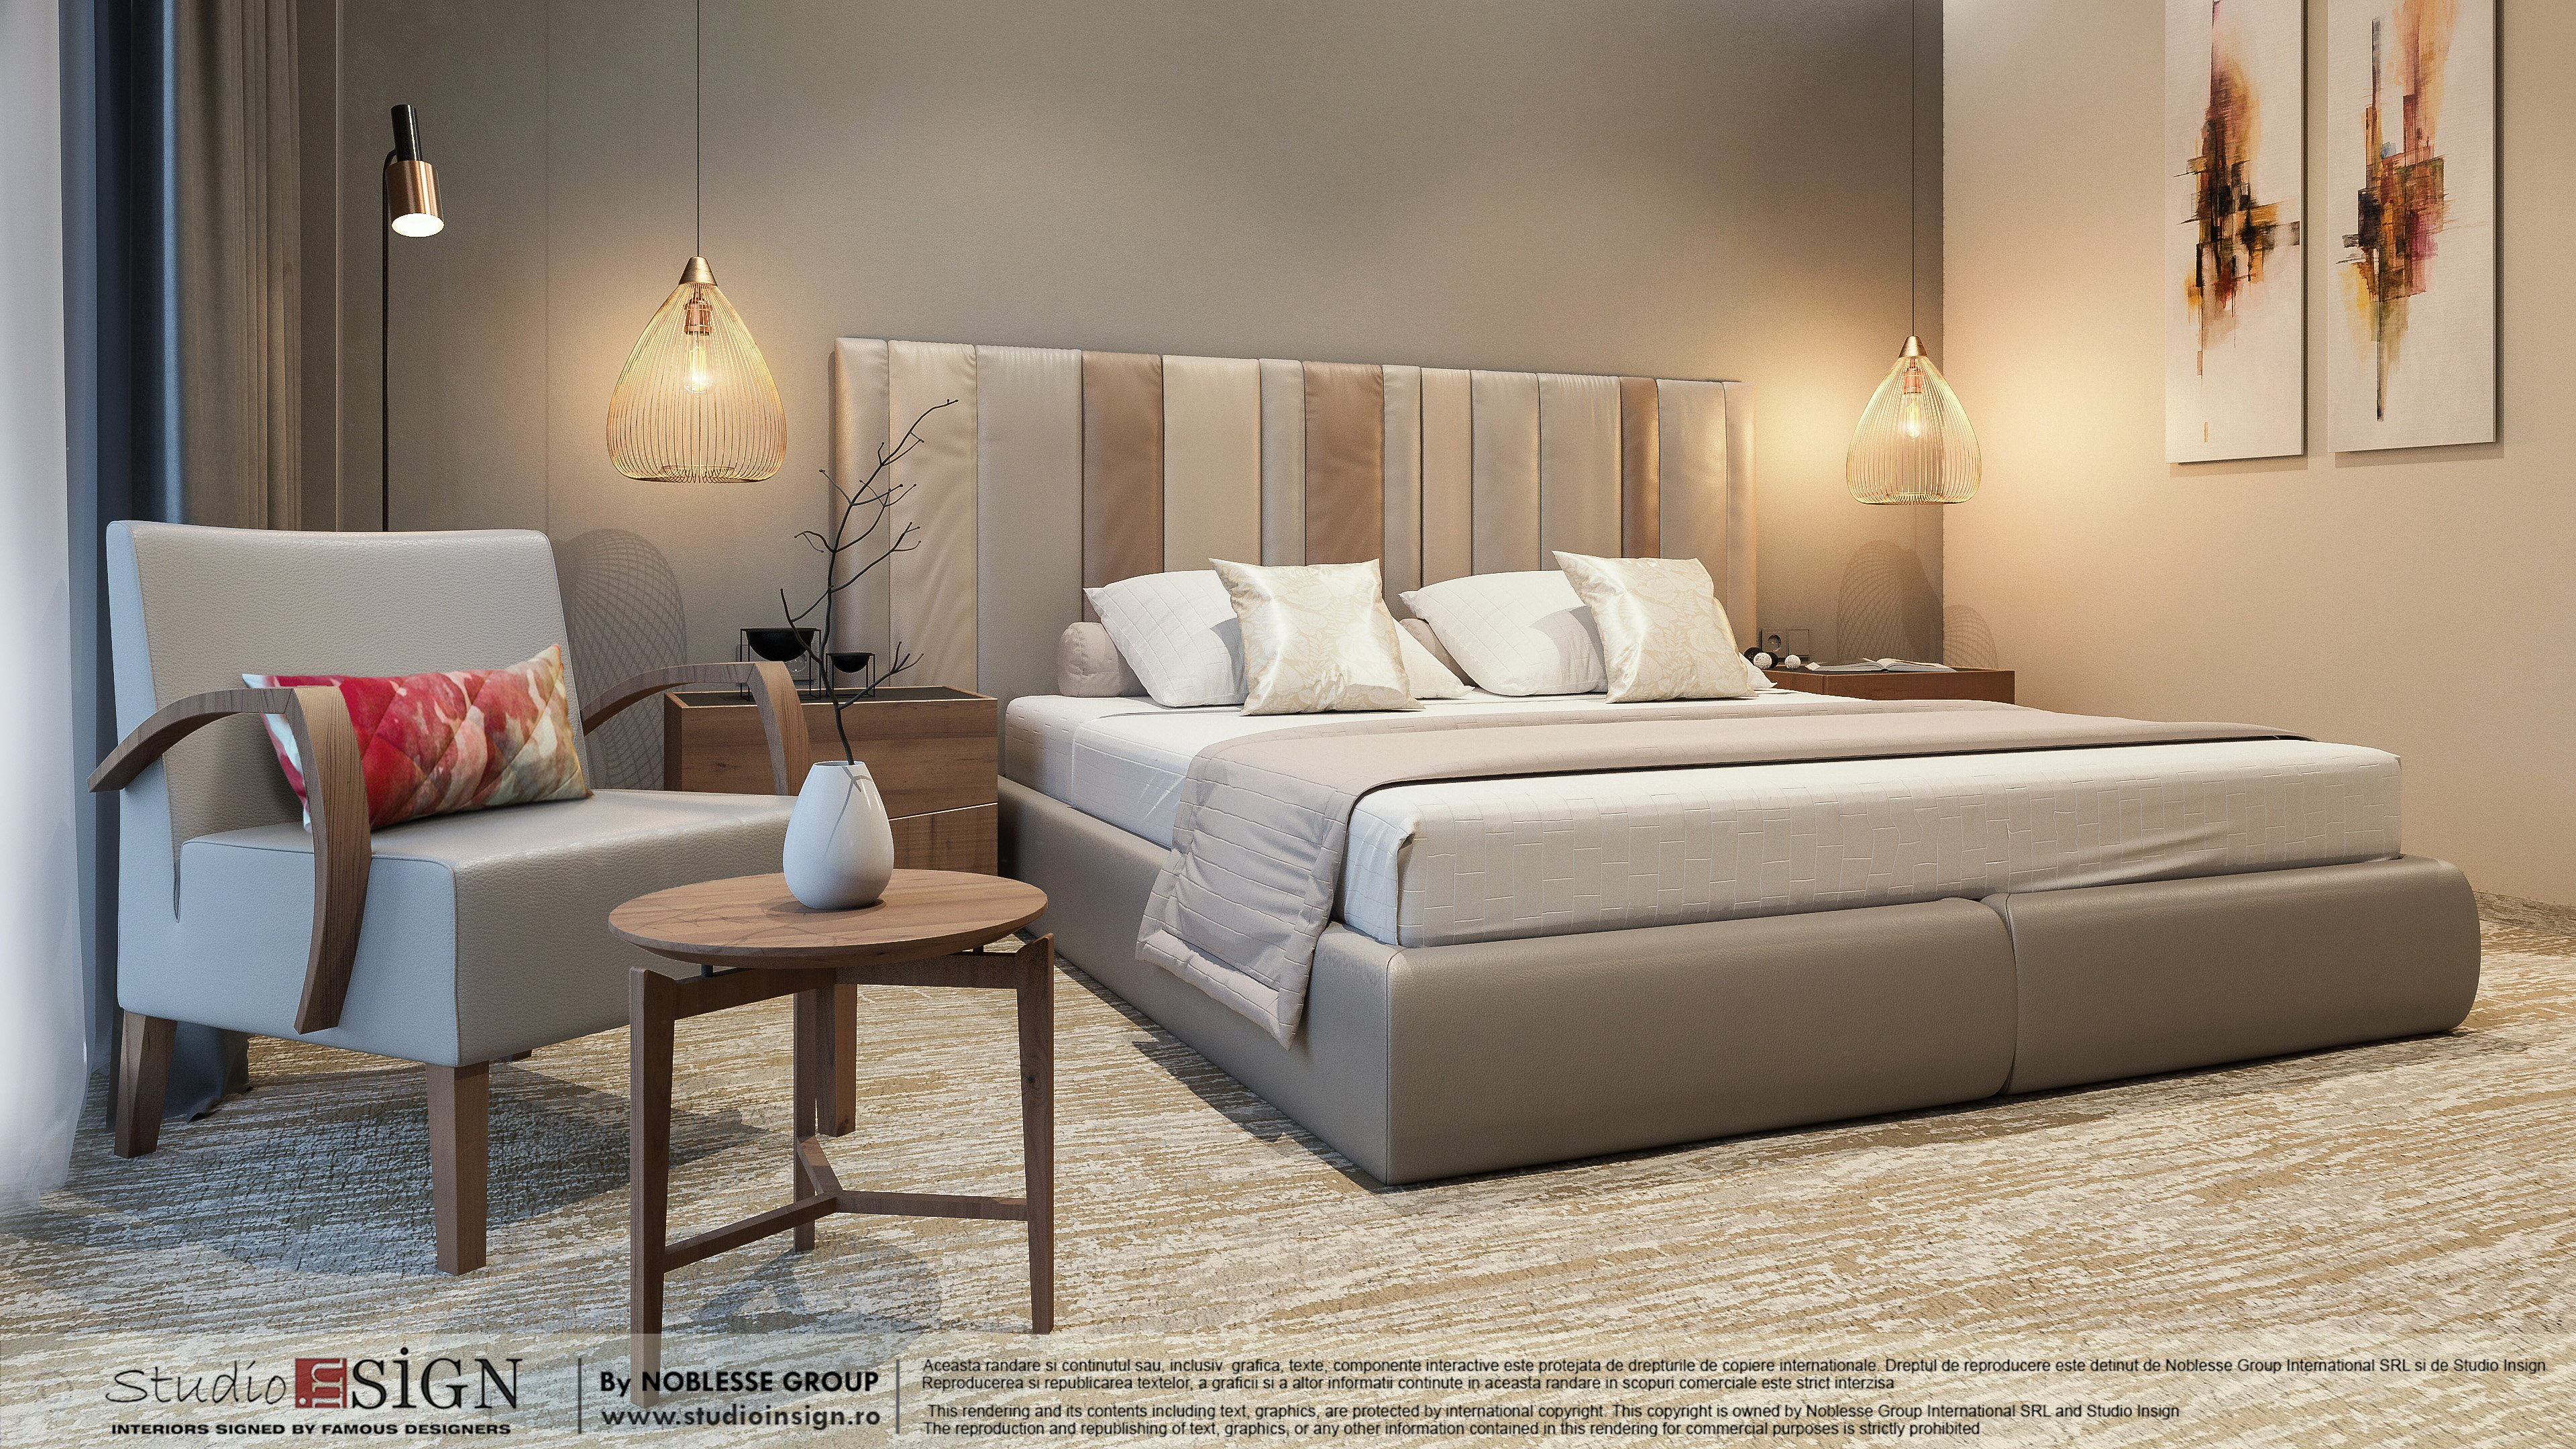 Golden Lake Balneo Wellness Center Design Concept Studio Insign